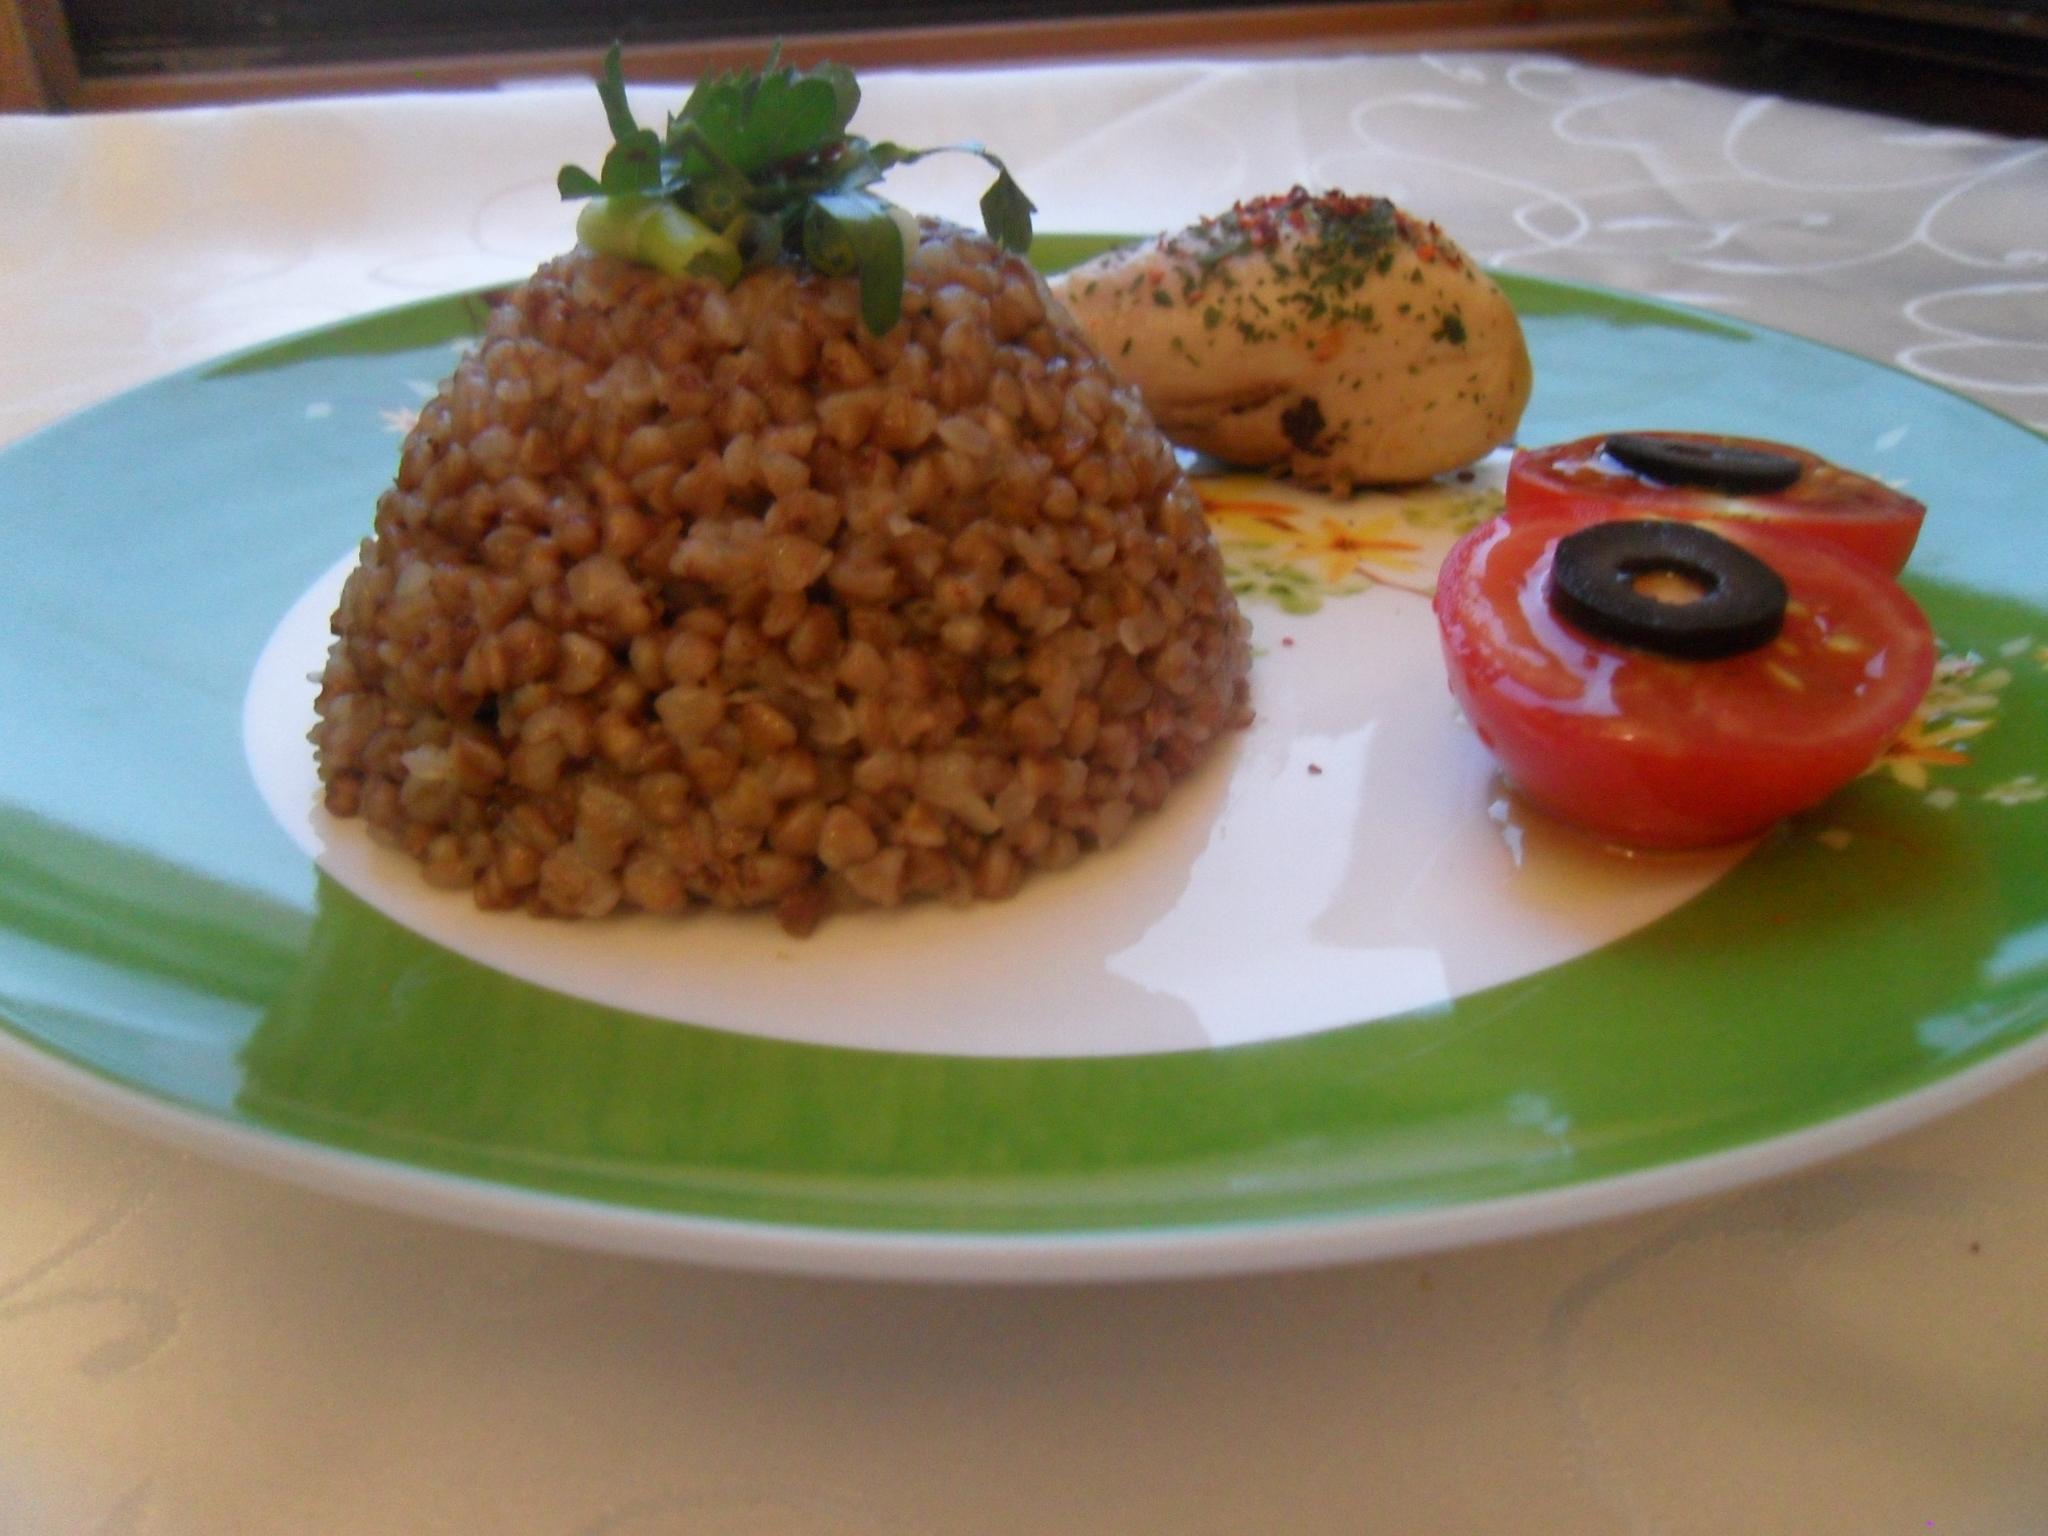 Greçka (karabuğday) Pilavı Tarifi